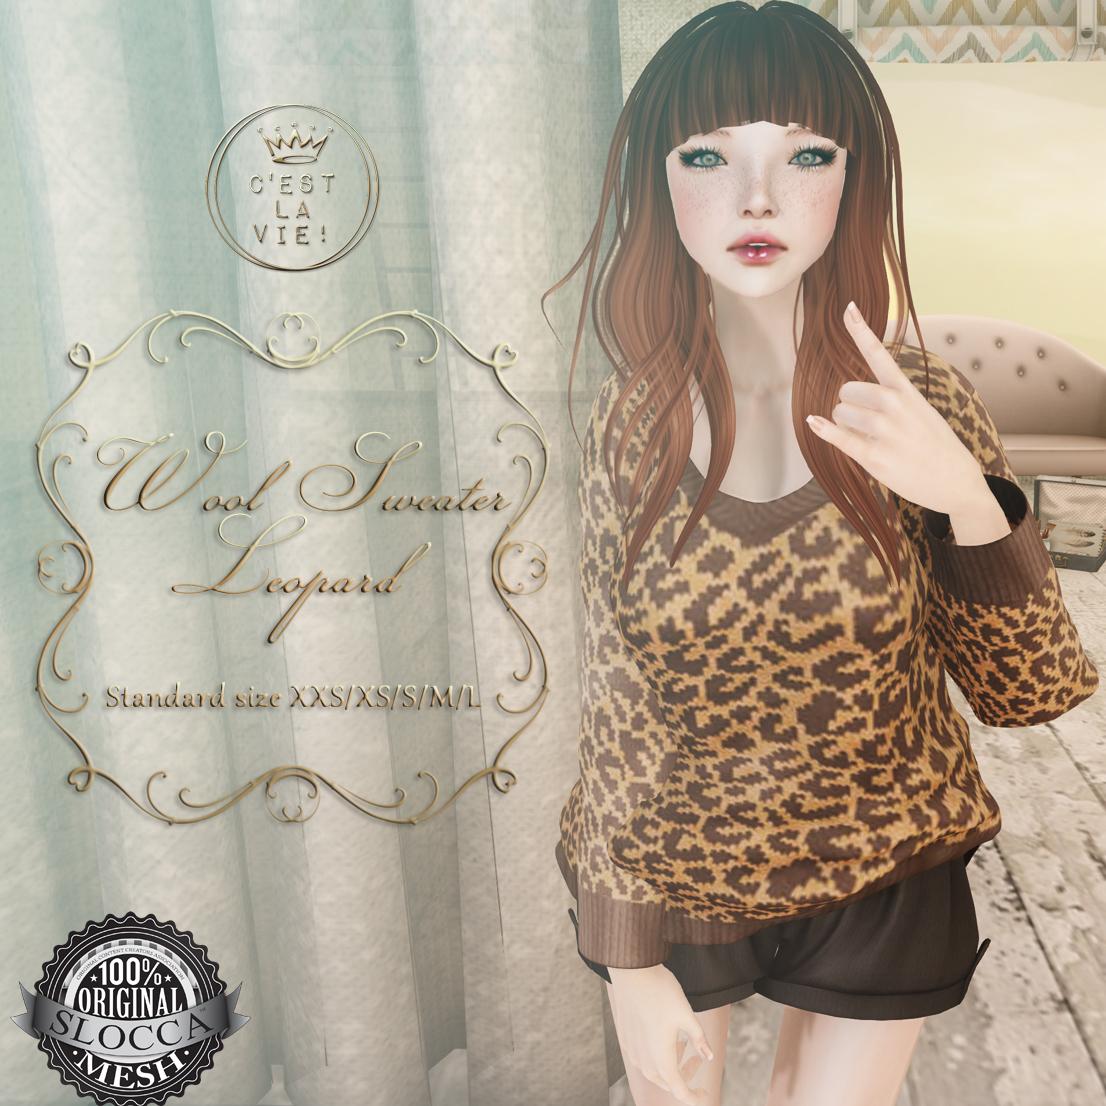 ::C'est la vie!:: Wool sweater leopard for Fifty Linden Fridays